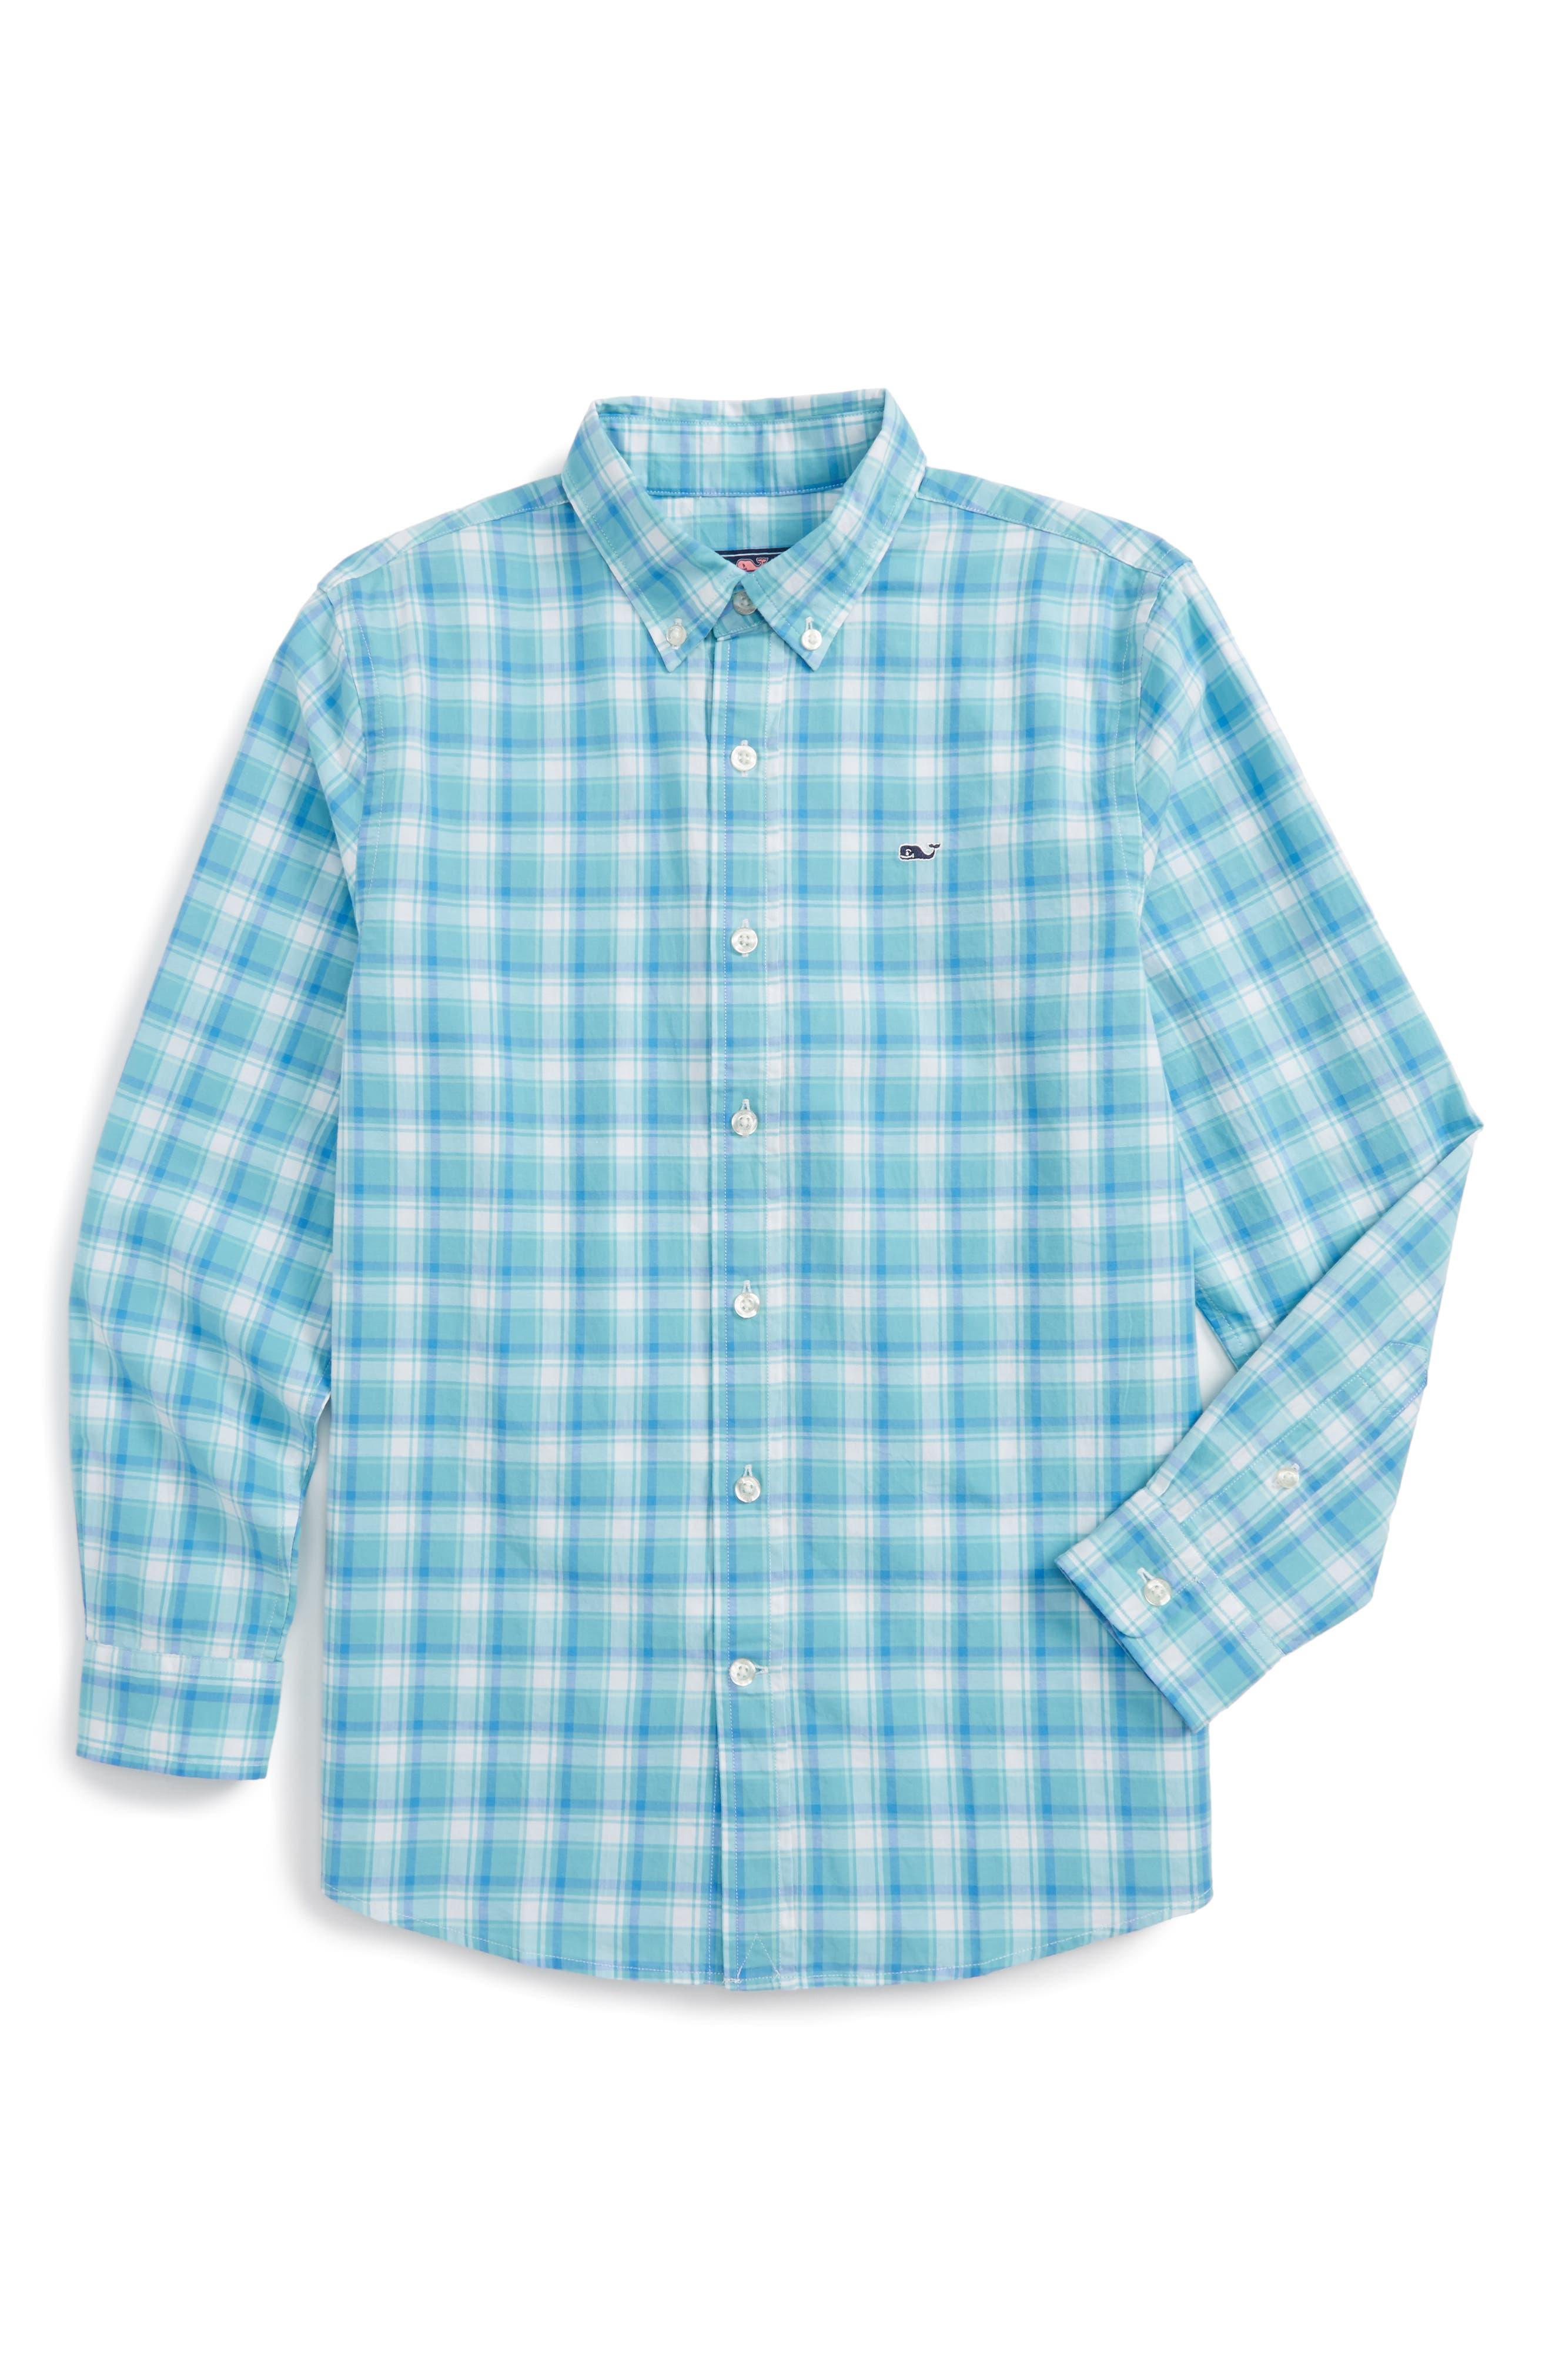 Vineyard Vines Point Plaid Cotton Shirt (Big Boys)